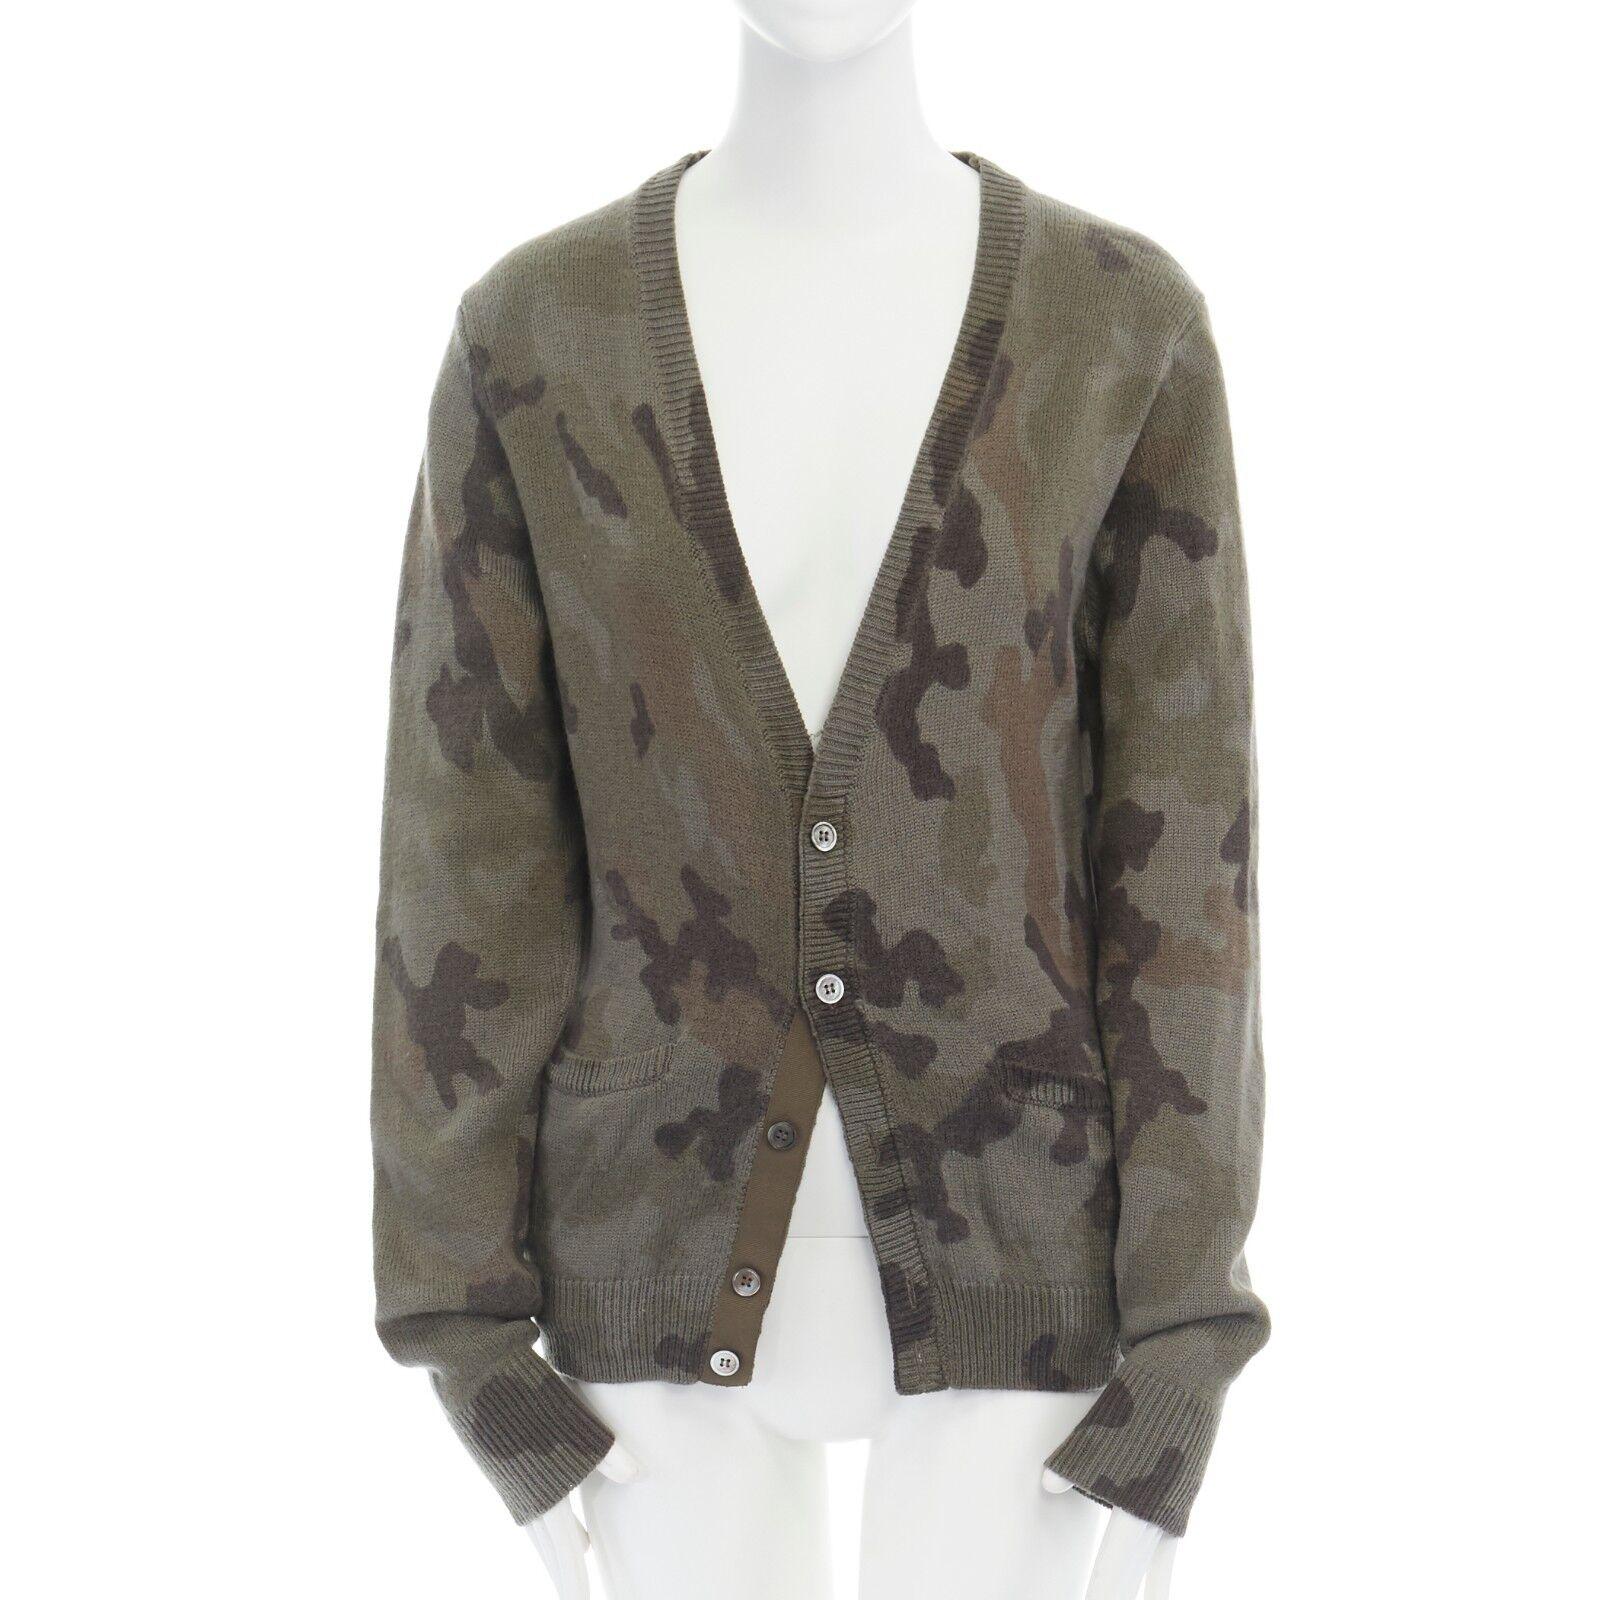 MARKUS LUPFER green camouflage merino wool button front cardigan swater M